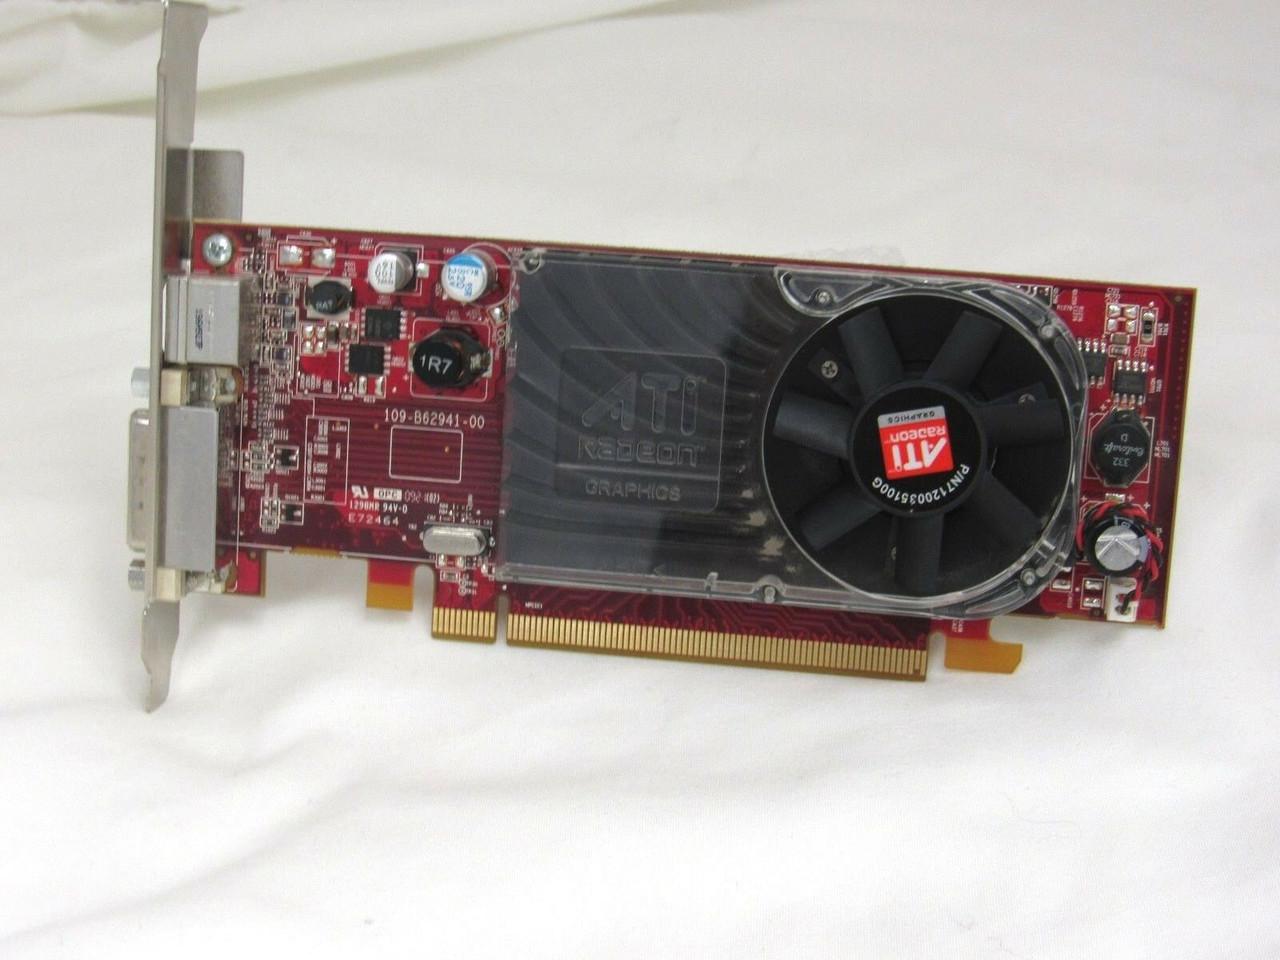 nVidia Quadro FX 570 Graphic Video Card 256MB Dual DVI PCIe x16 70-4